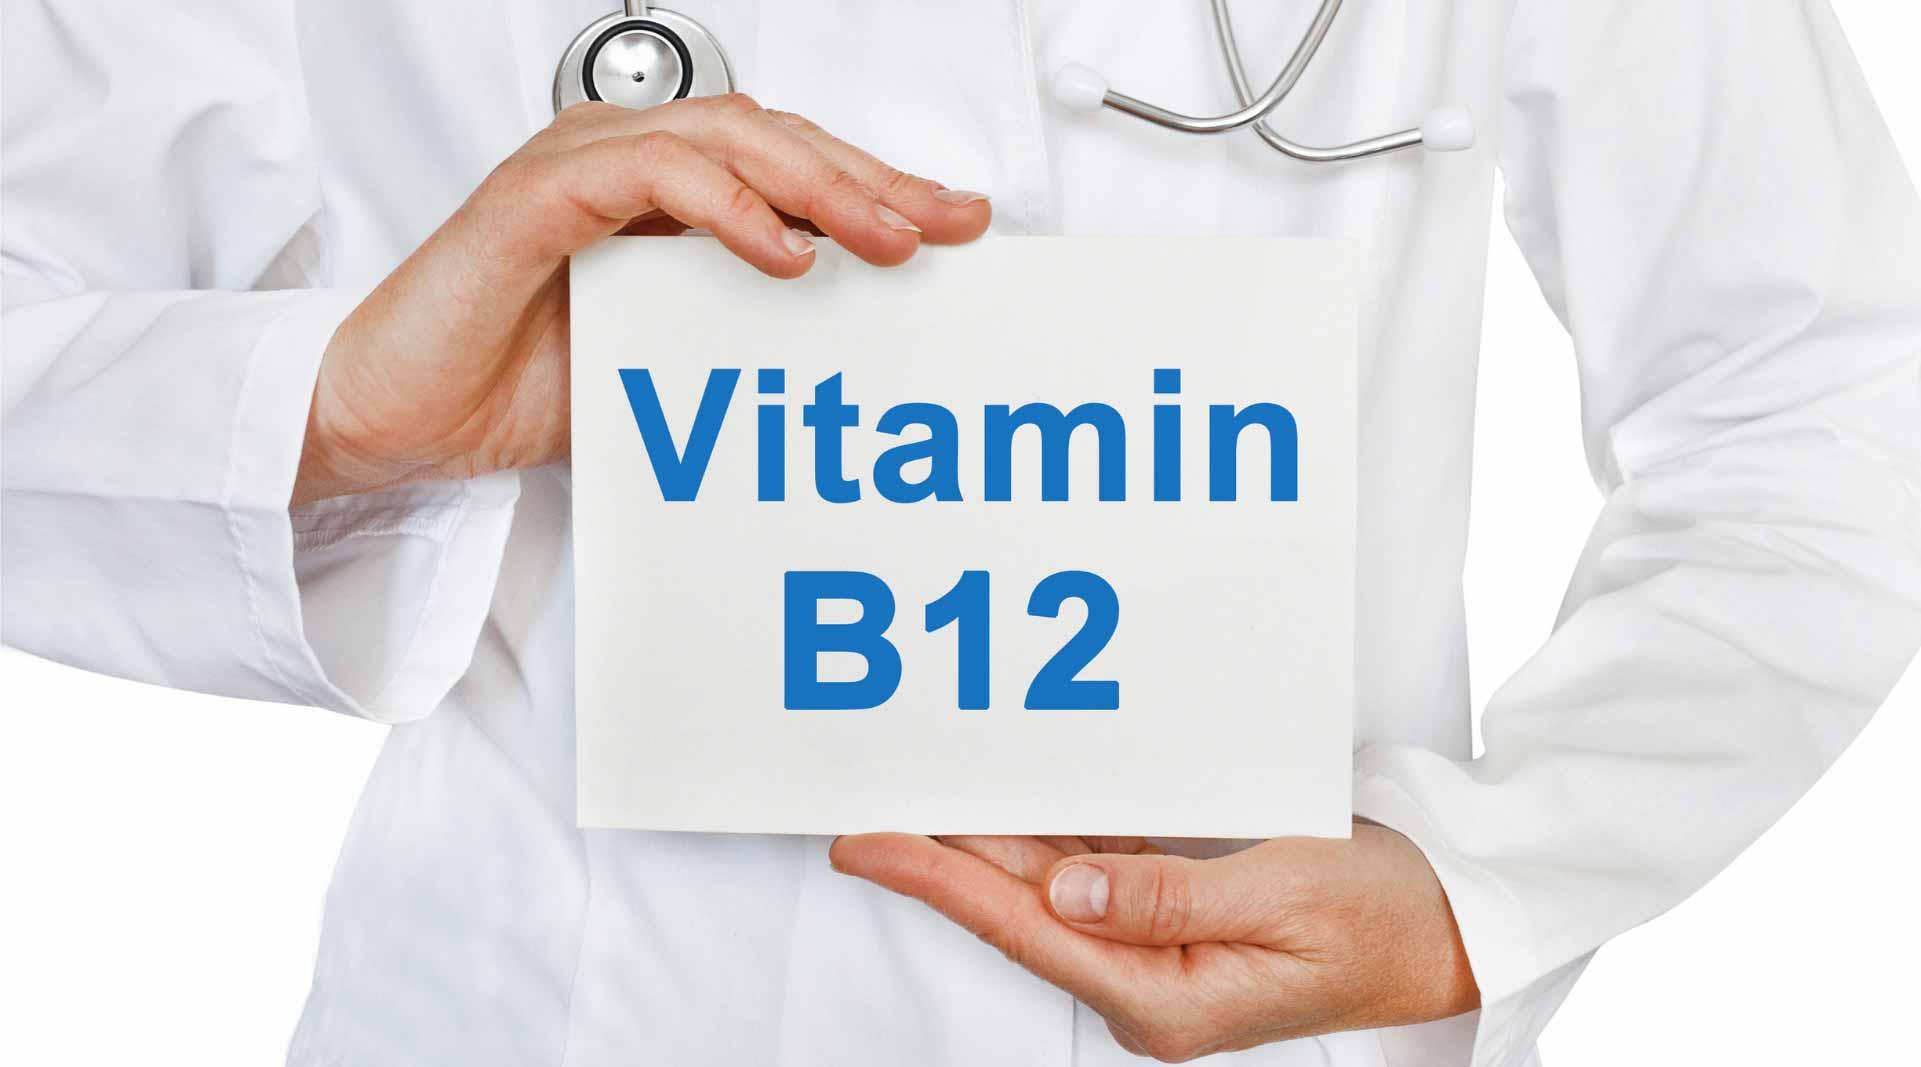 Vitamin B12 injection